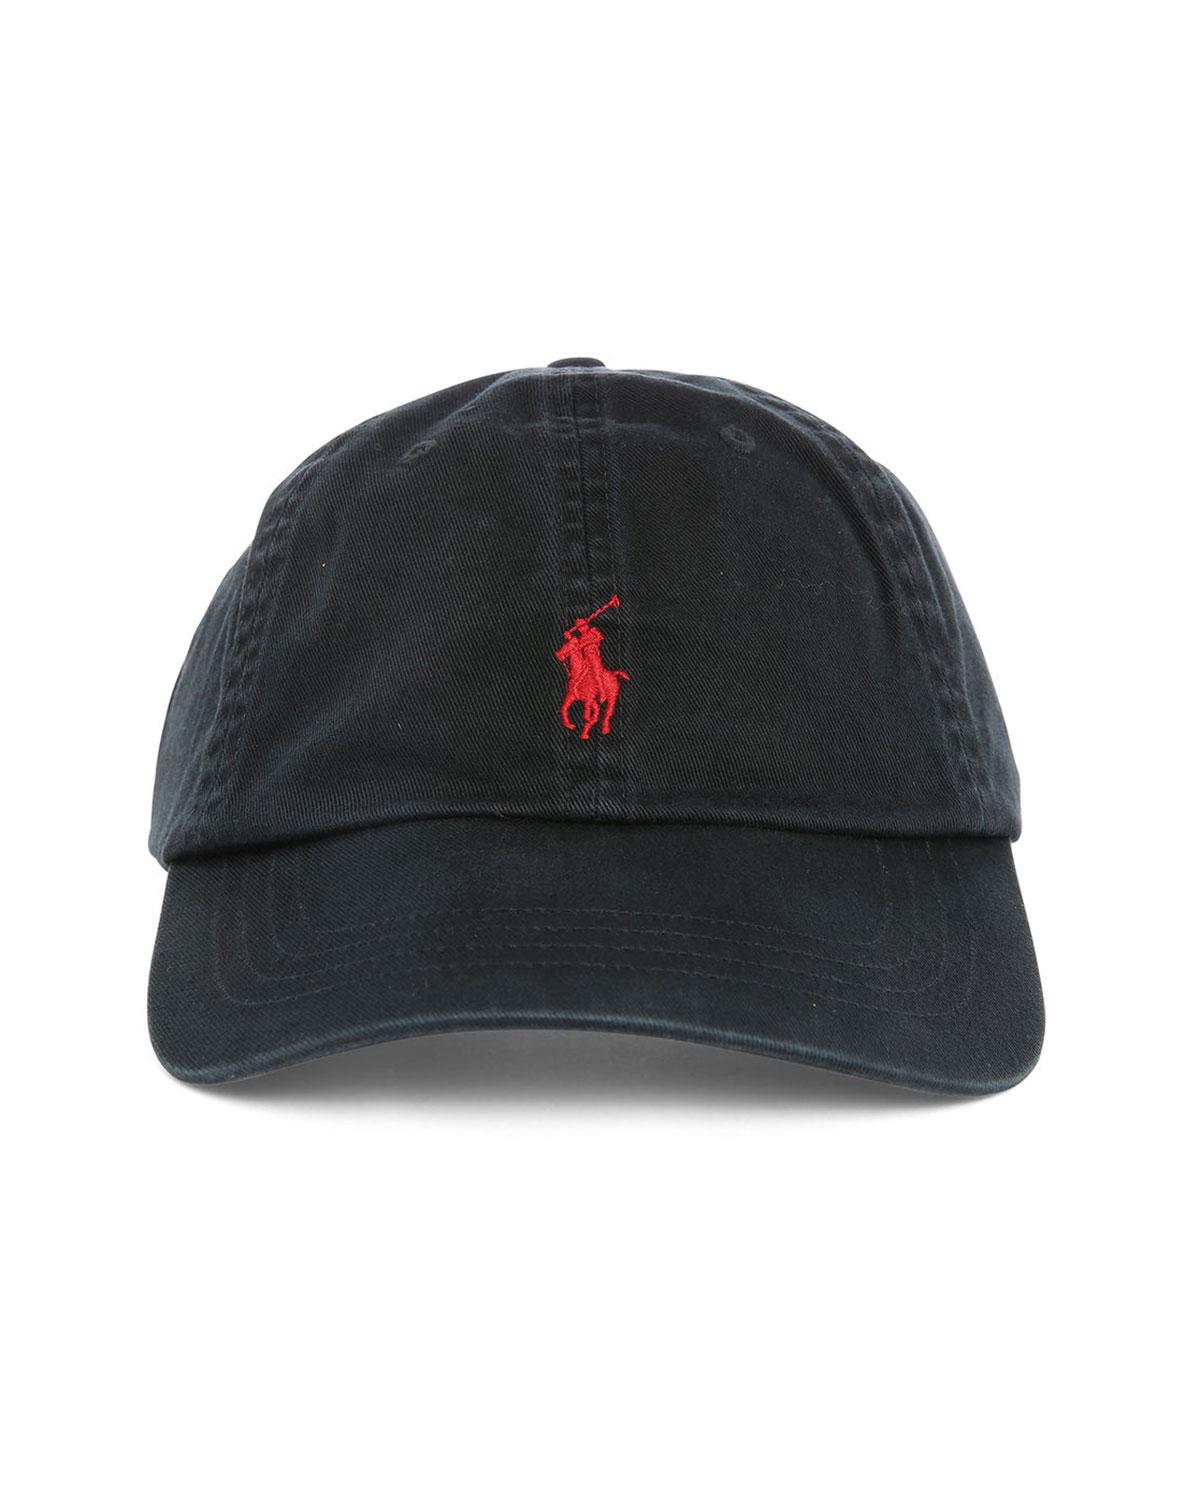 czapka ralph lauren kup teraz najlepsze ceny i opinie sklep. Black Bedroom Furniture Sets. Home Design Ideas